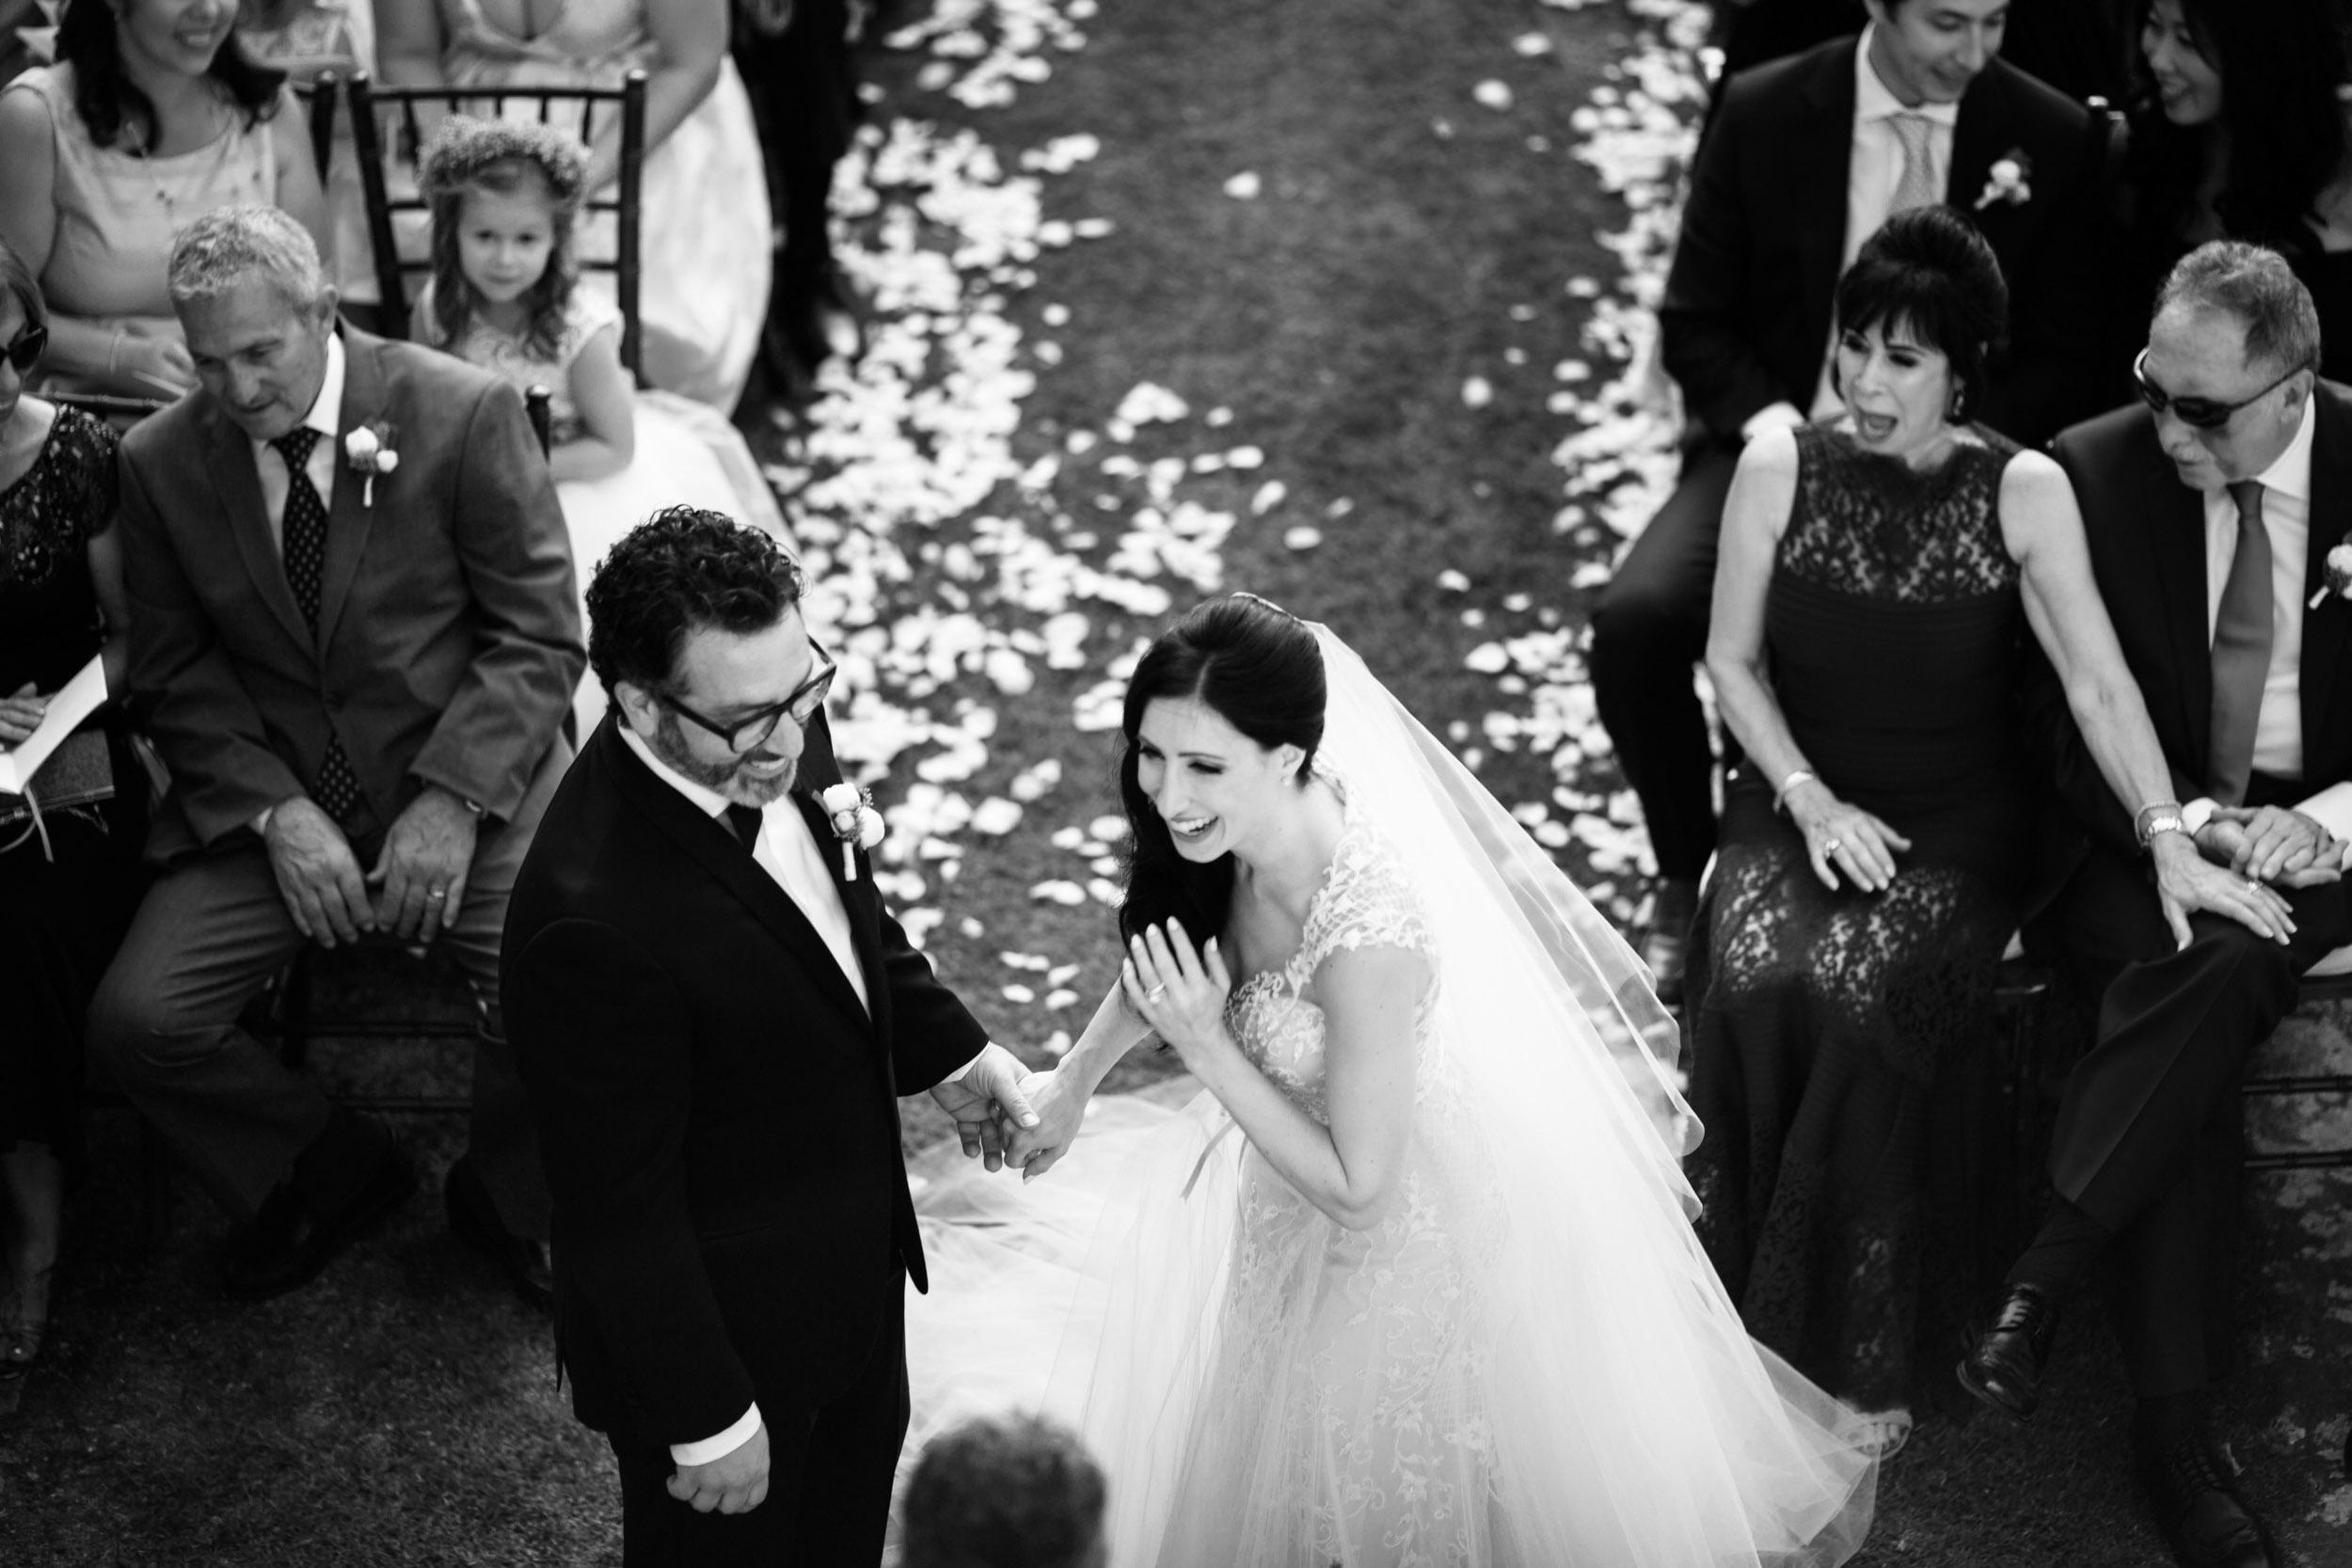 villa-gamberaia-florence-italy-destination-wedding-46.jpg